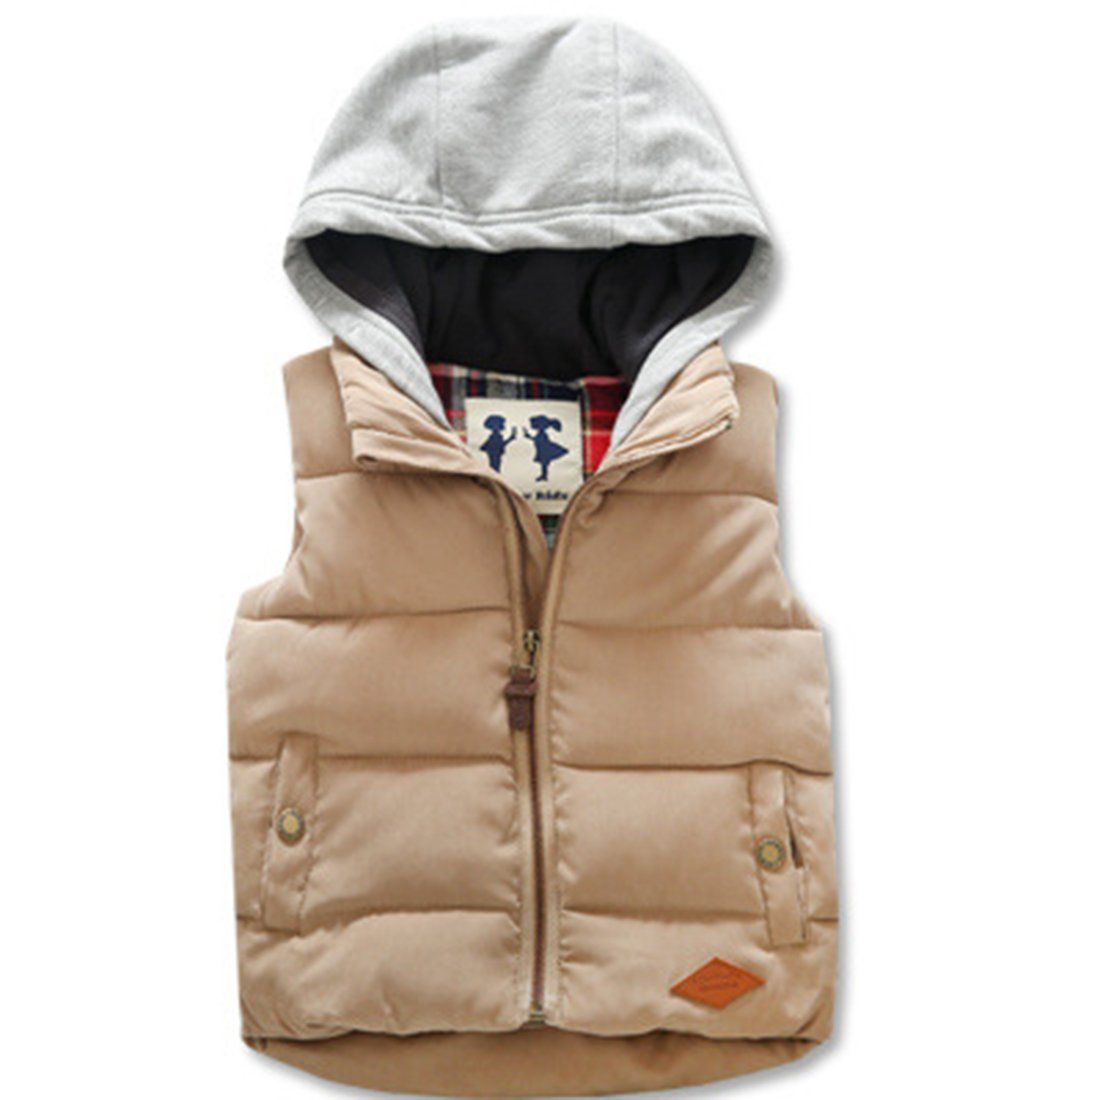 Hiheart Boys Girls Winter Down Vest Sleeveless Jackets